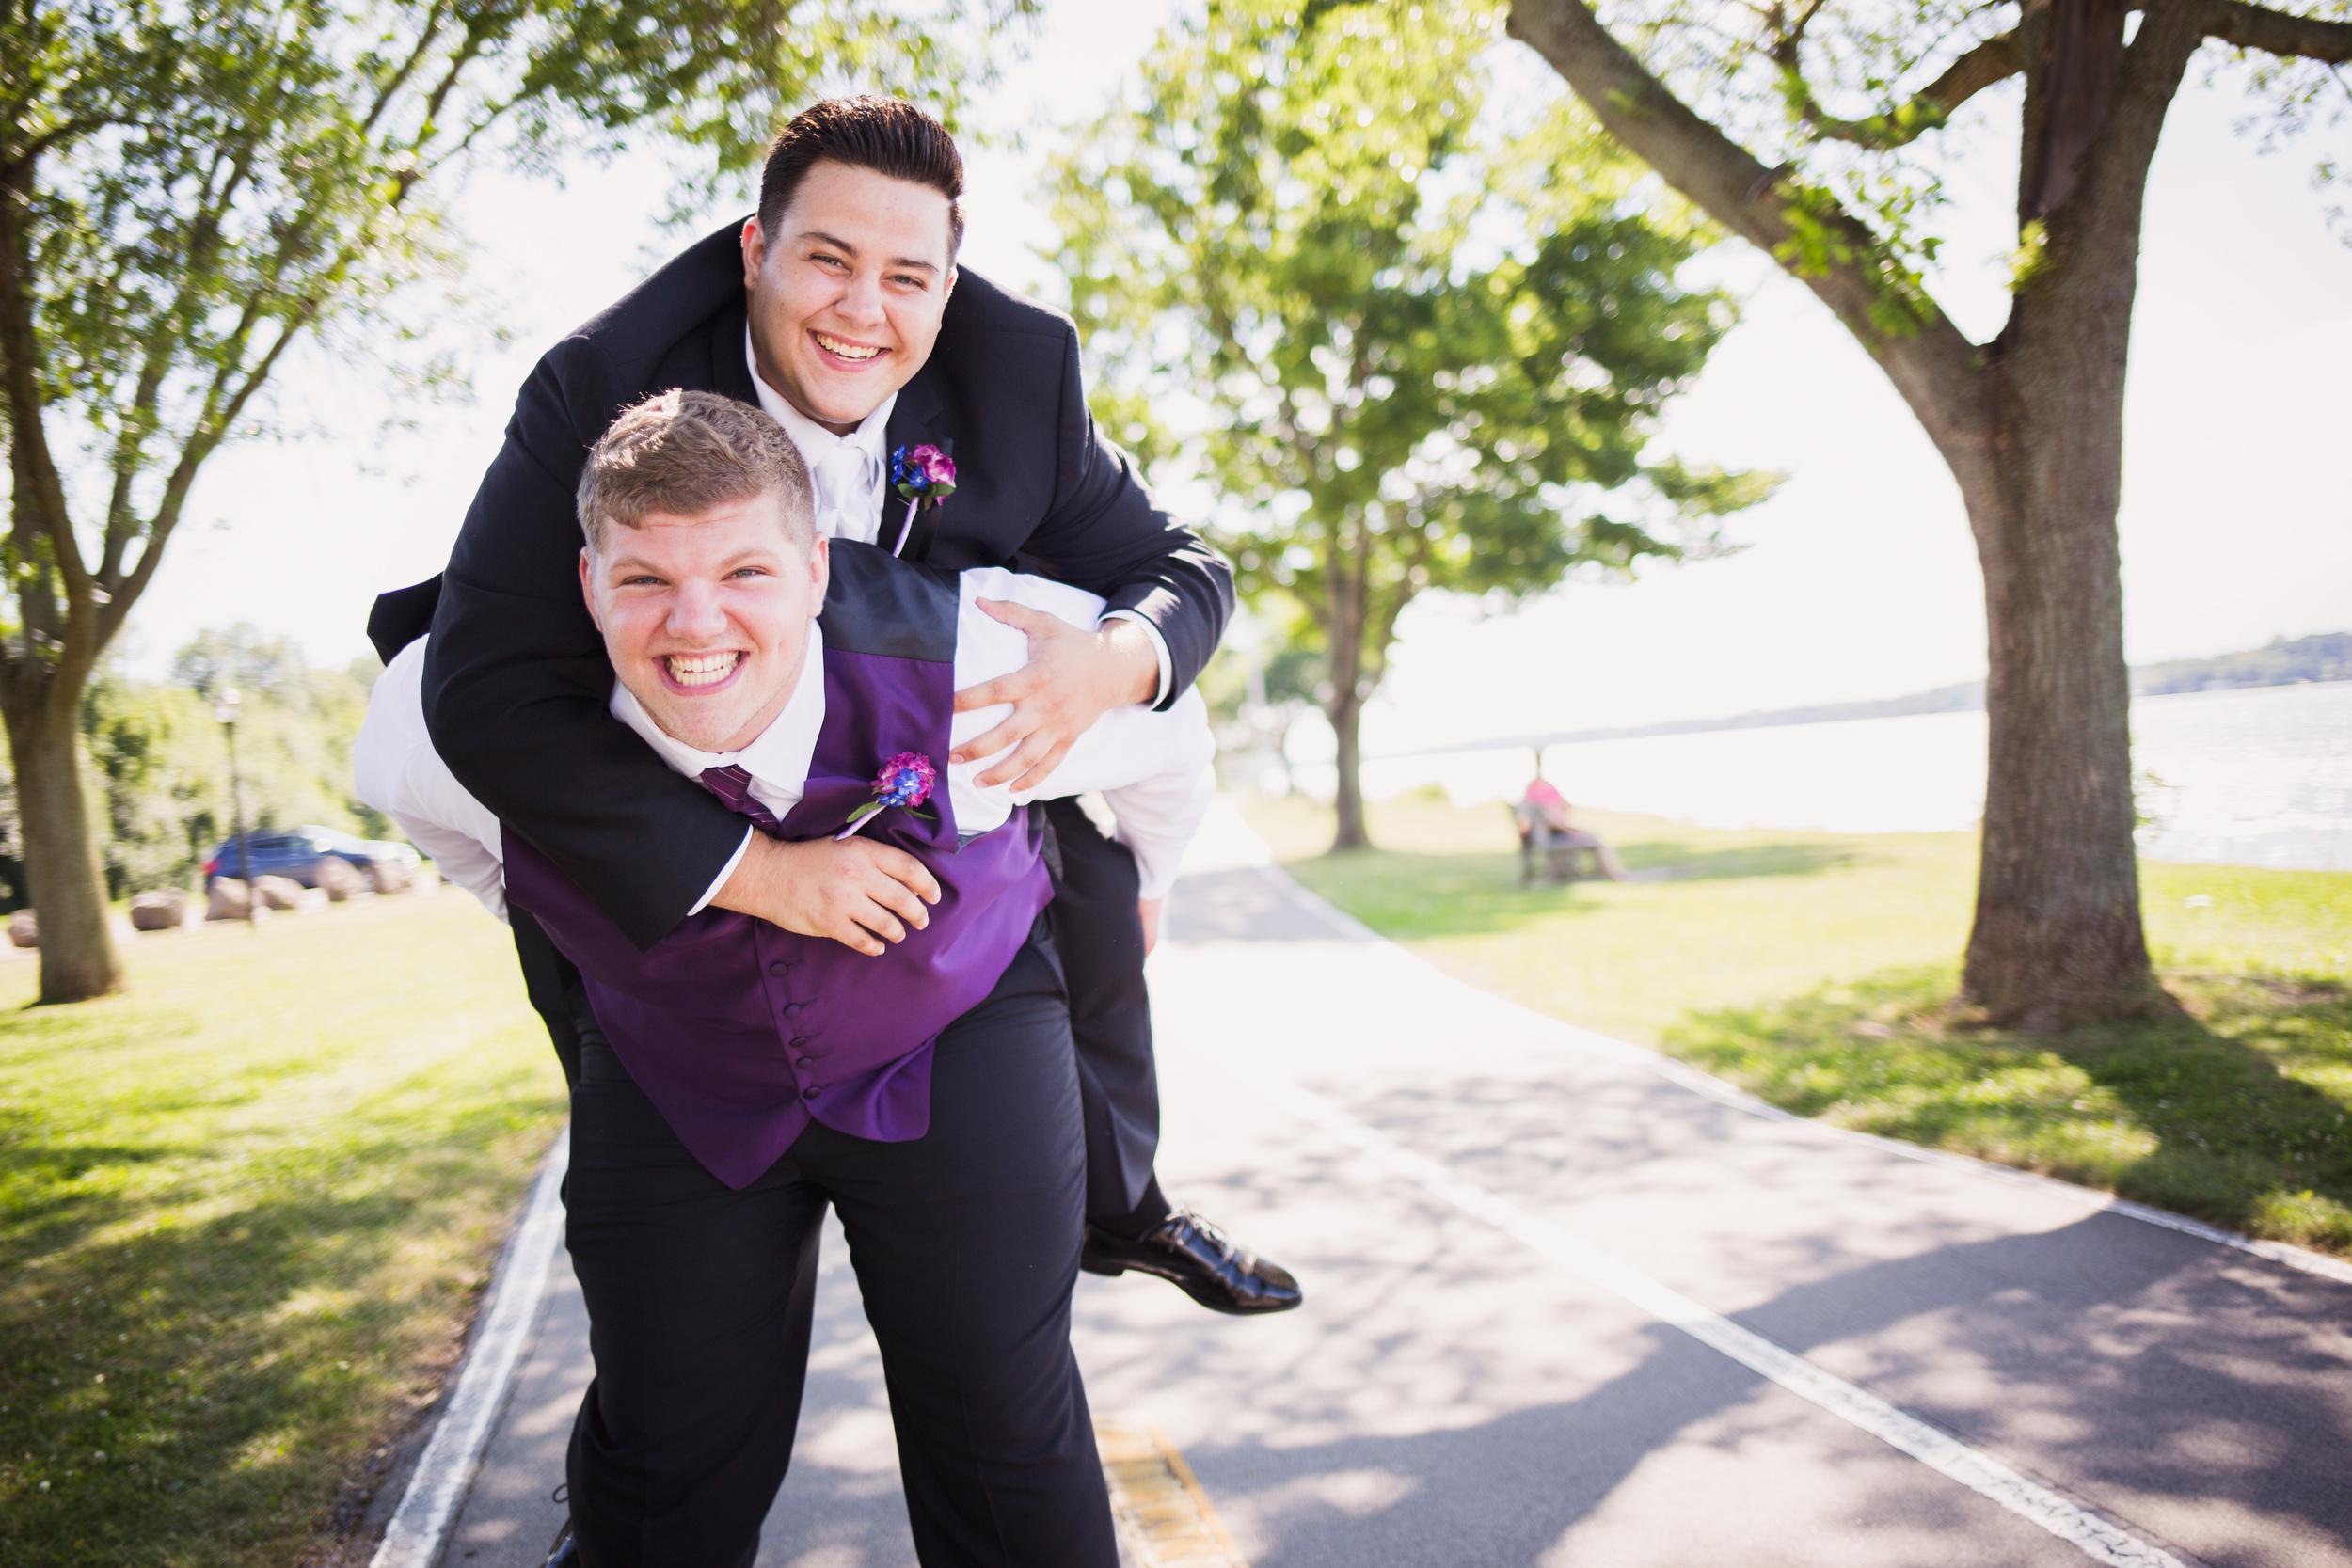 Stephanie-and-Mitchell-Buffalo-NY-Wedding-Stefan-Ludwig-Photography-34.jpg